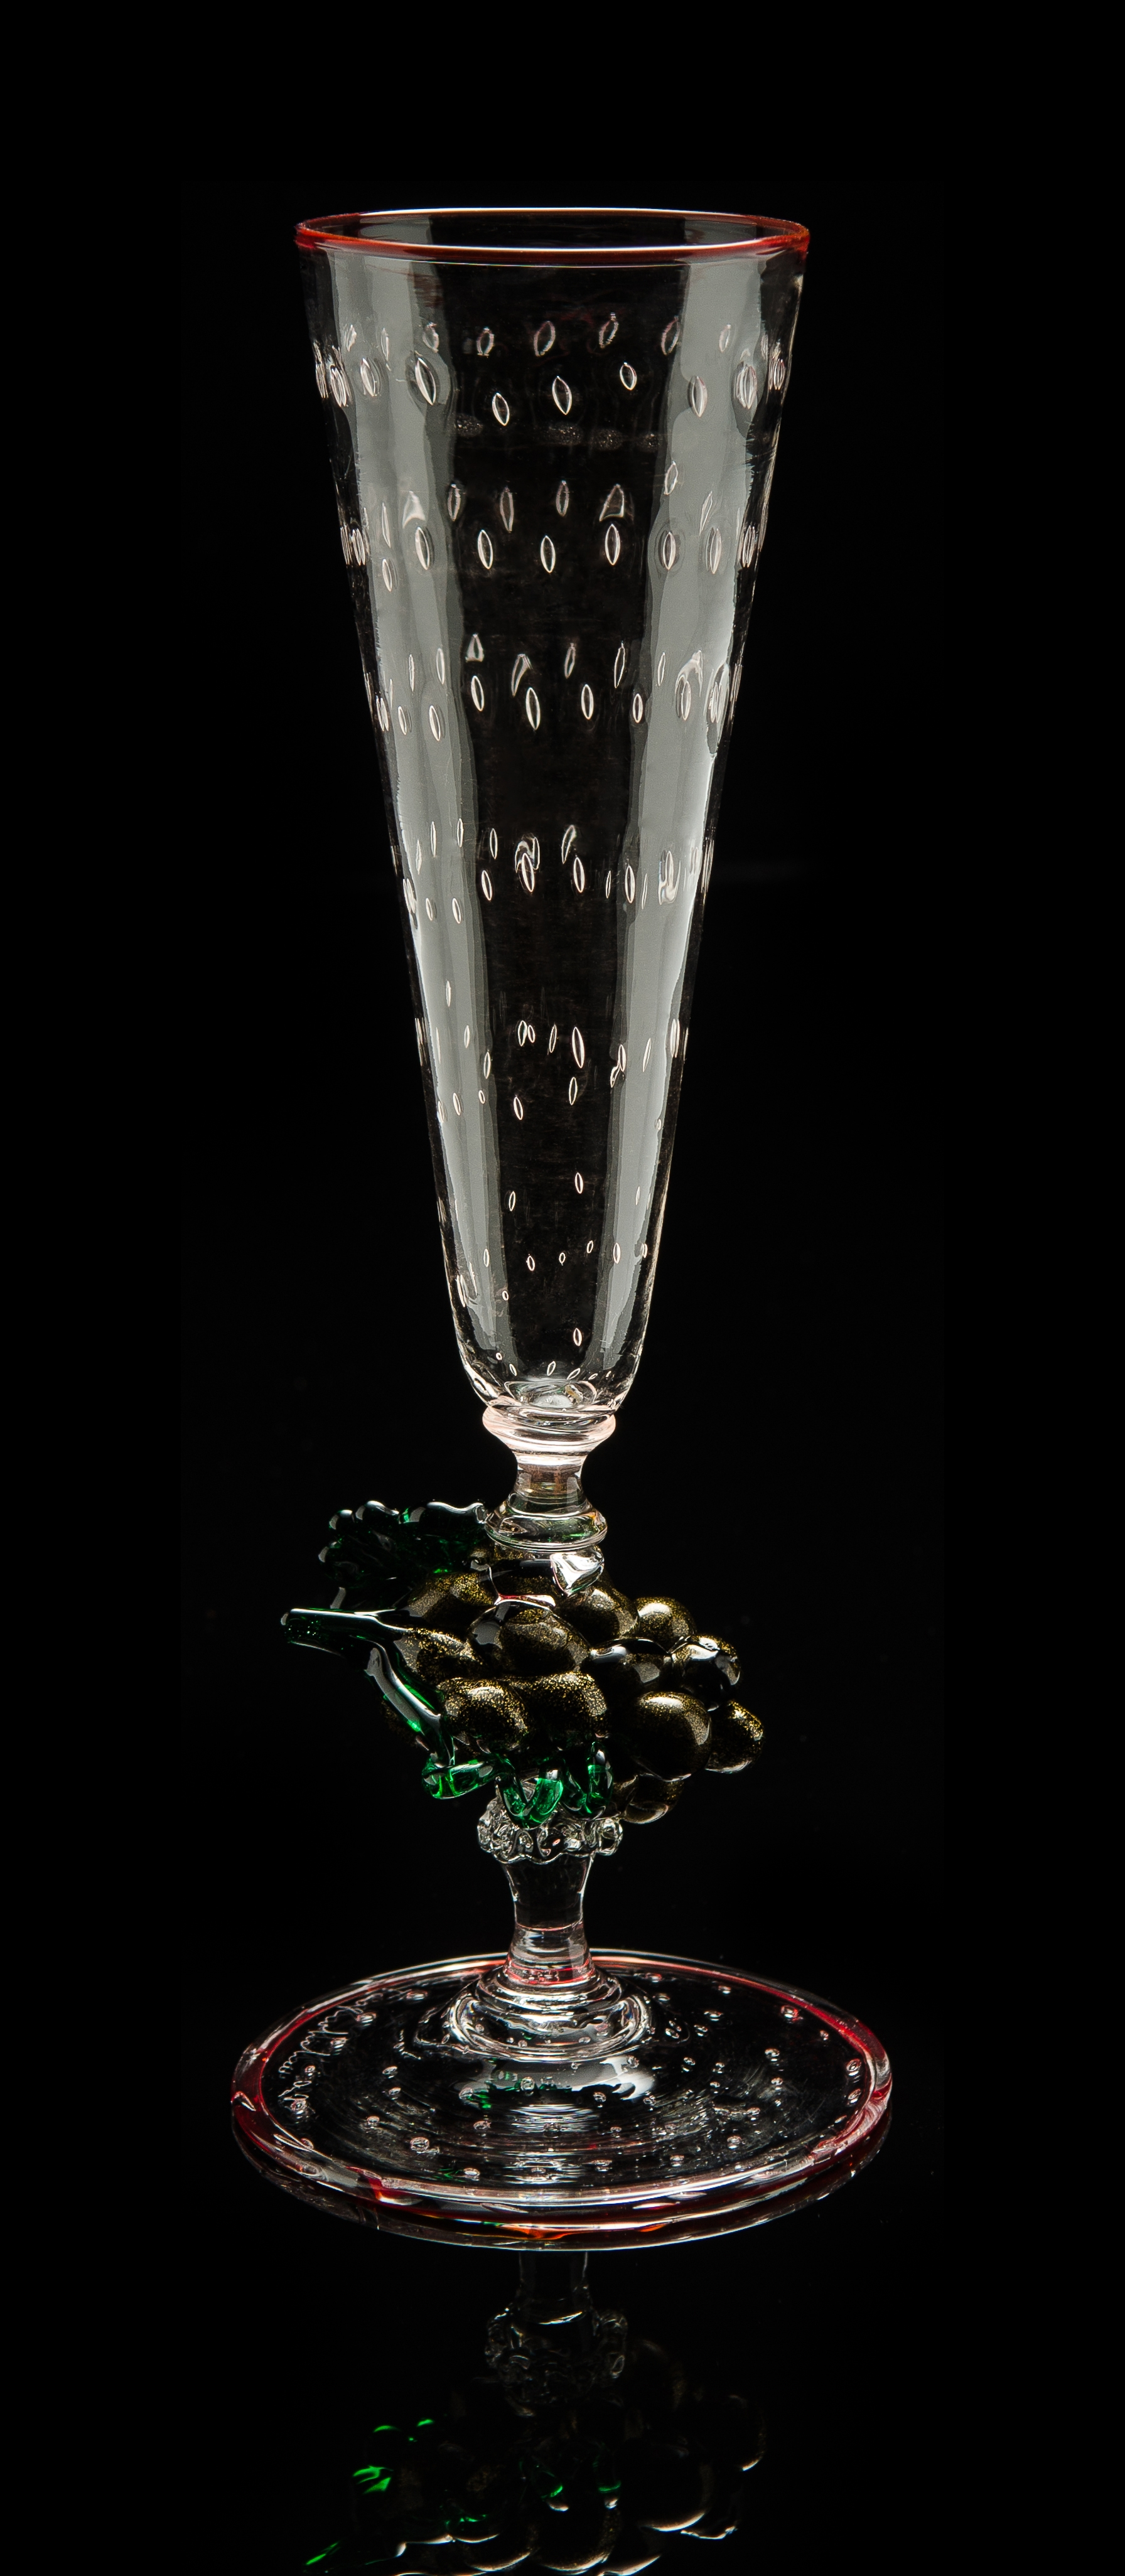 Lino Tagliapietra,  Goblet  (1991-1994, glass, 10 1/4 x 3 1/4 x 3 1/4 inches), LT.86